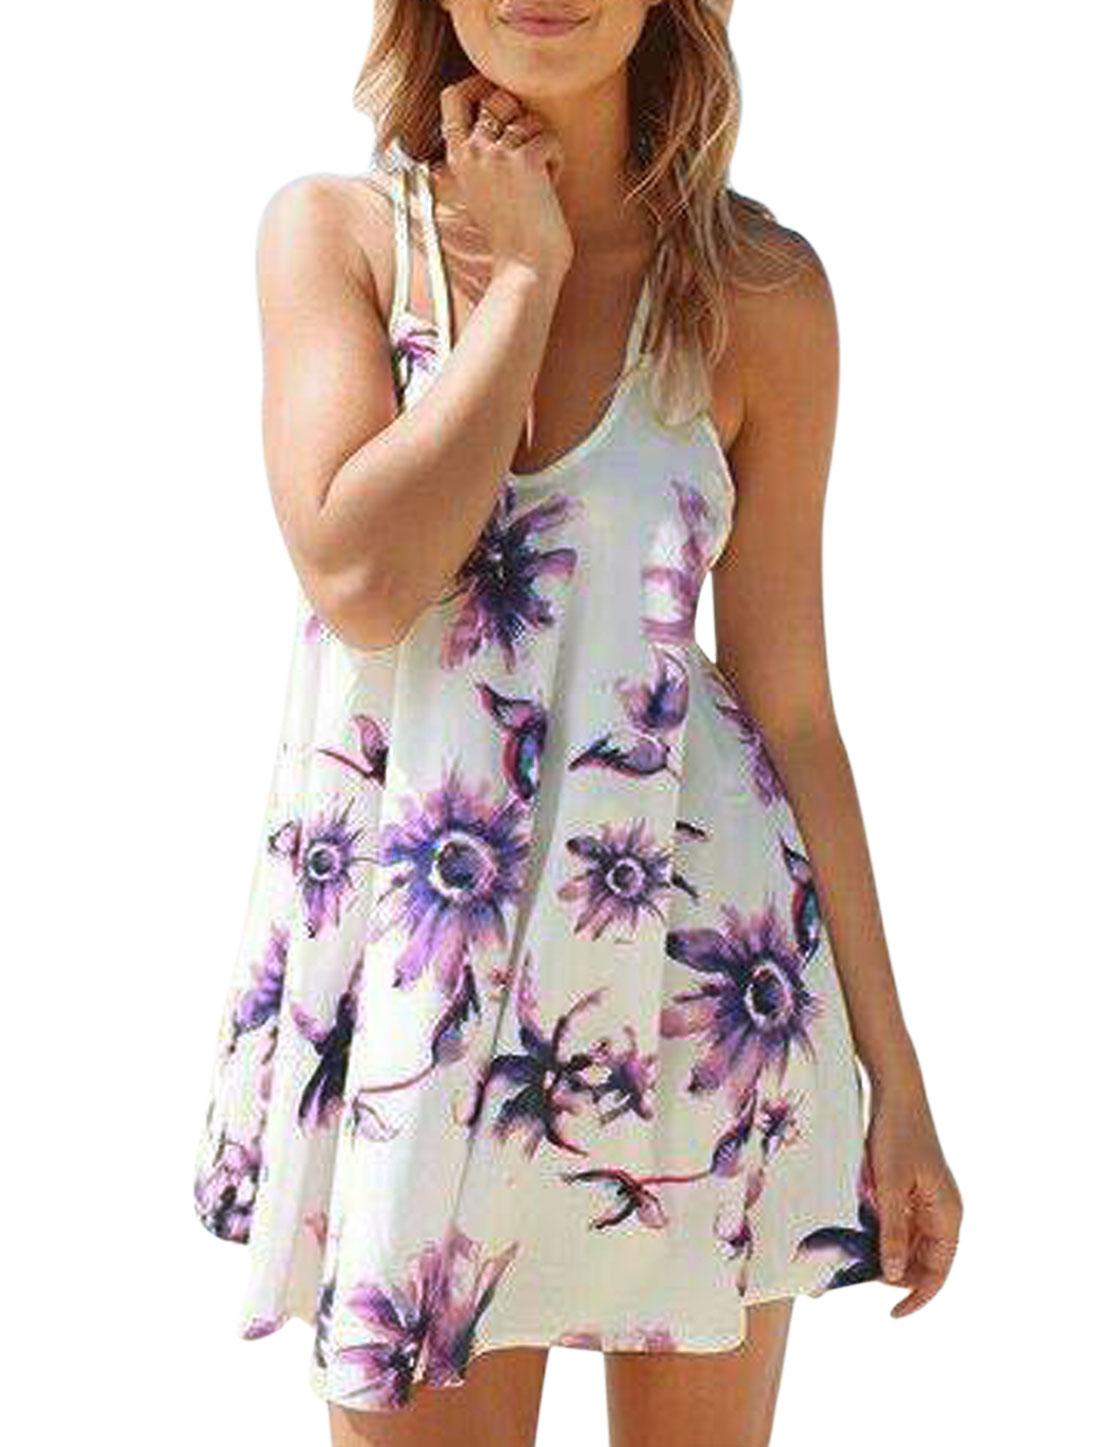 Woman Floral Prints Adjustable Spaghetti Straps Semi Sheer Sundress White S